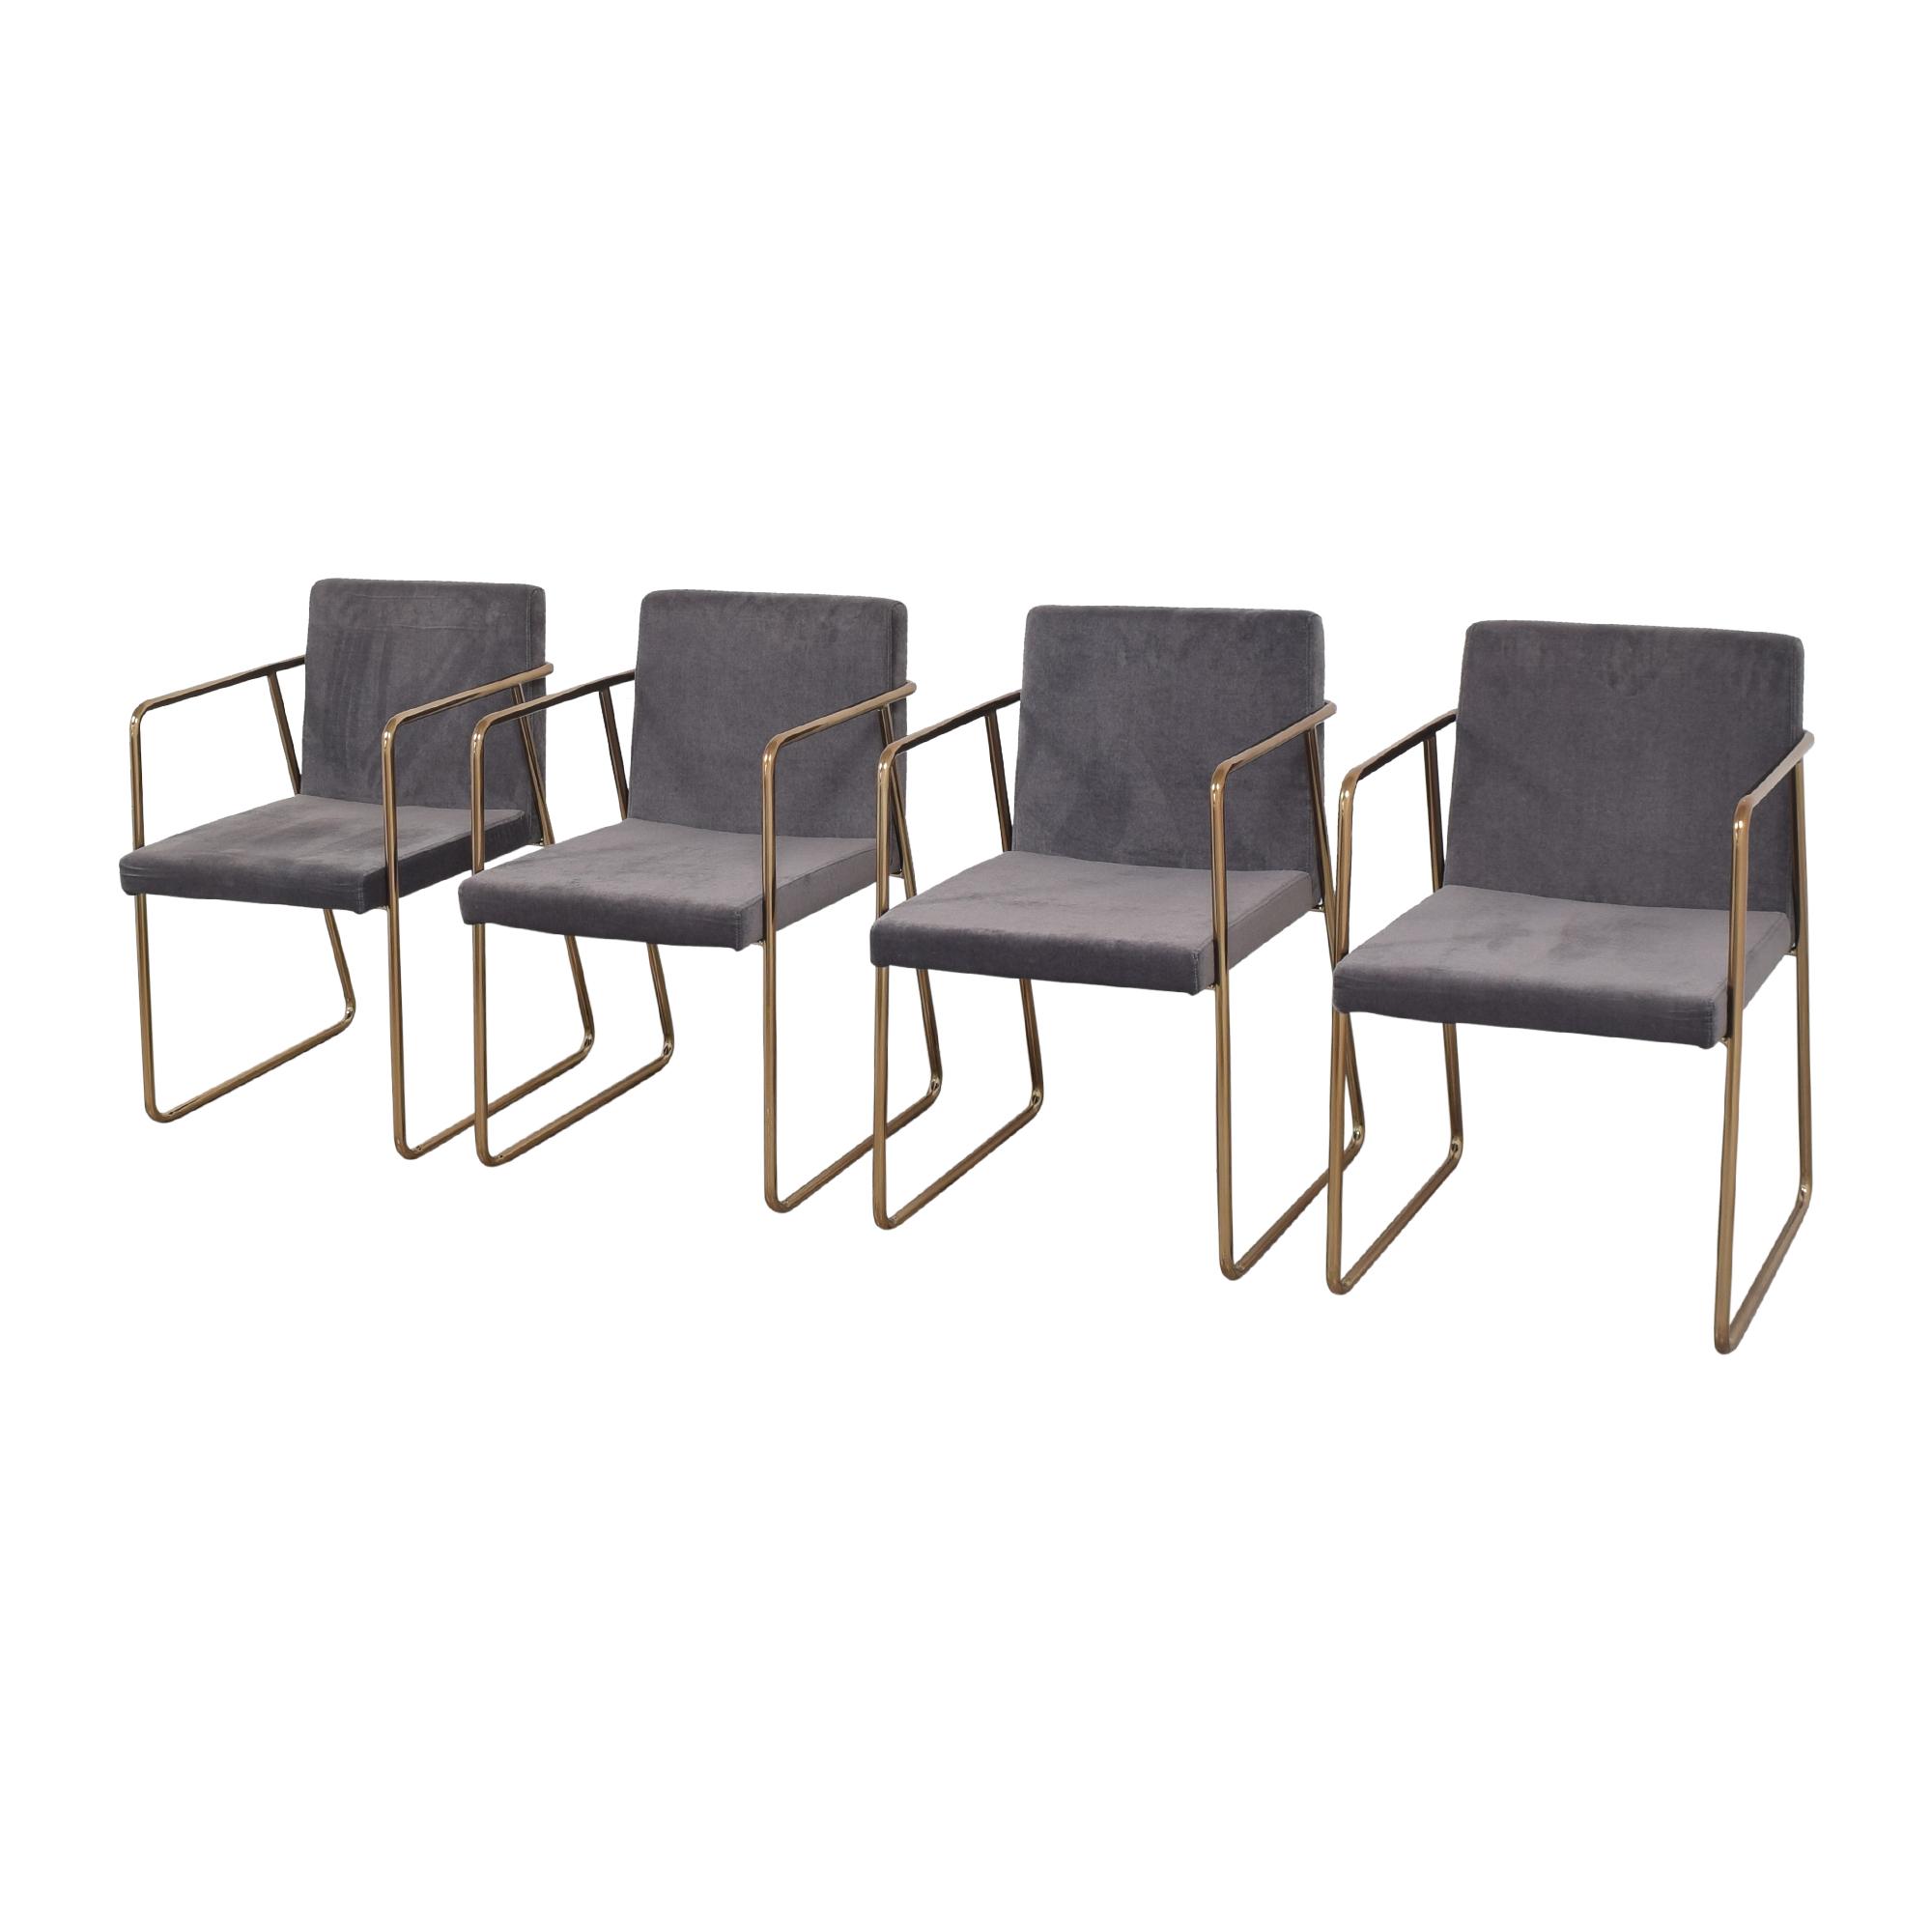 shop CB2 Rouka Chairs CB2 Chairs